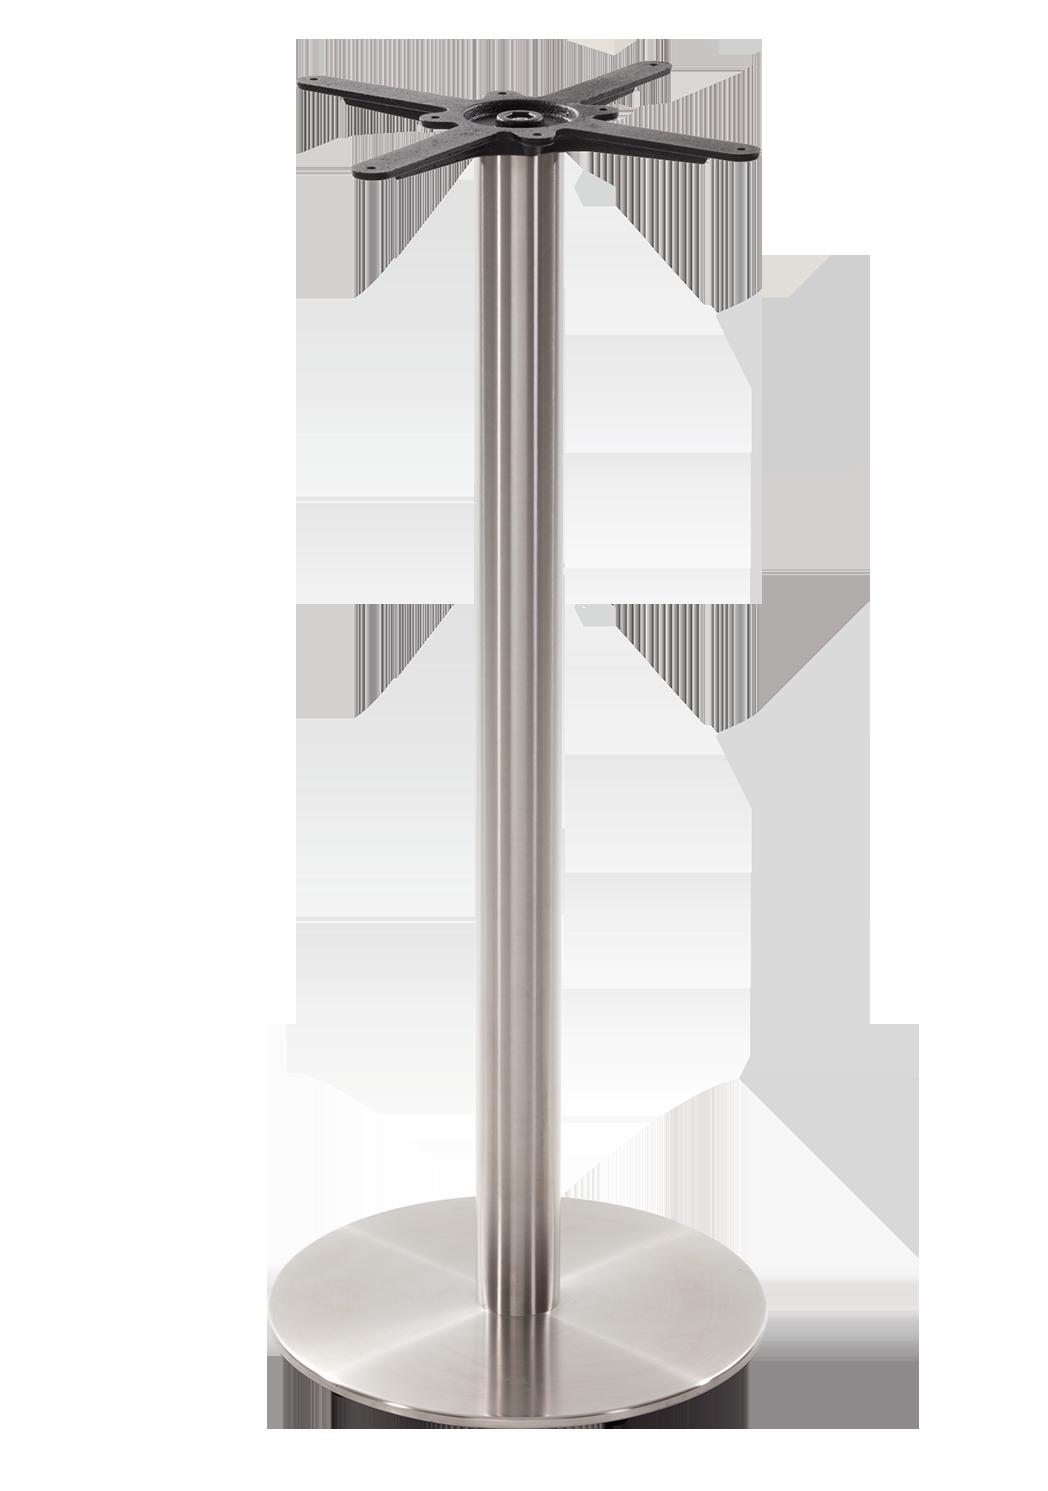 Round s/steel table base - Medium - Poseur height - 1050 mm